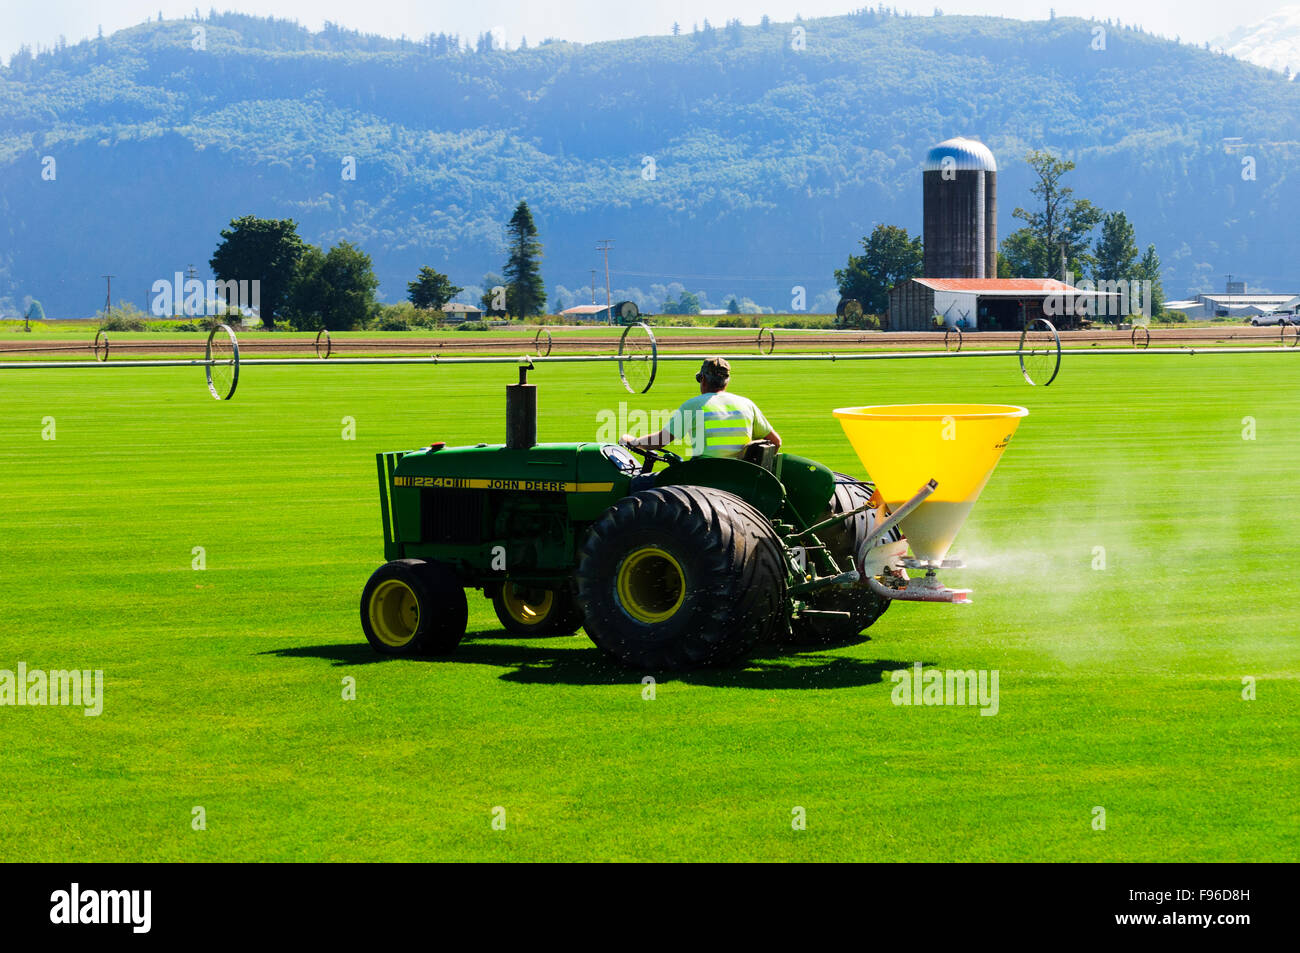 A turf farmer spreads fertilizer over turf in Sumas Washington State, USA. - Stock Image